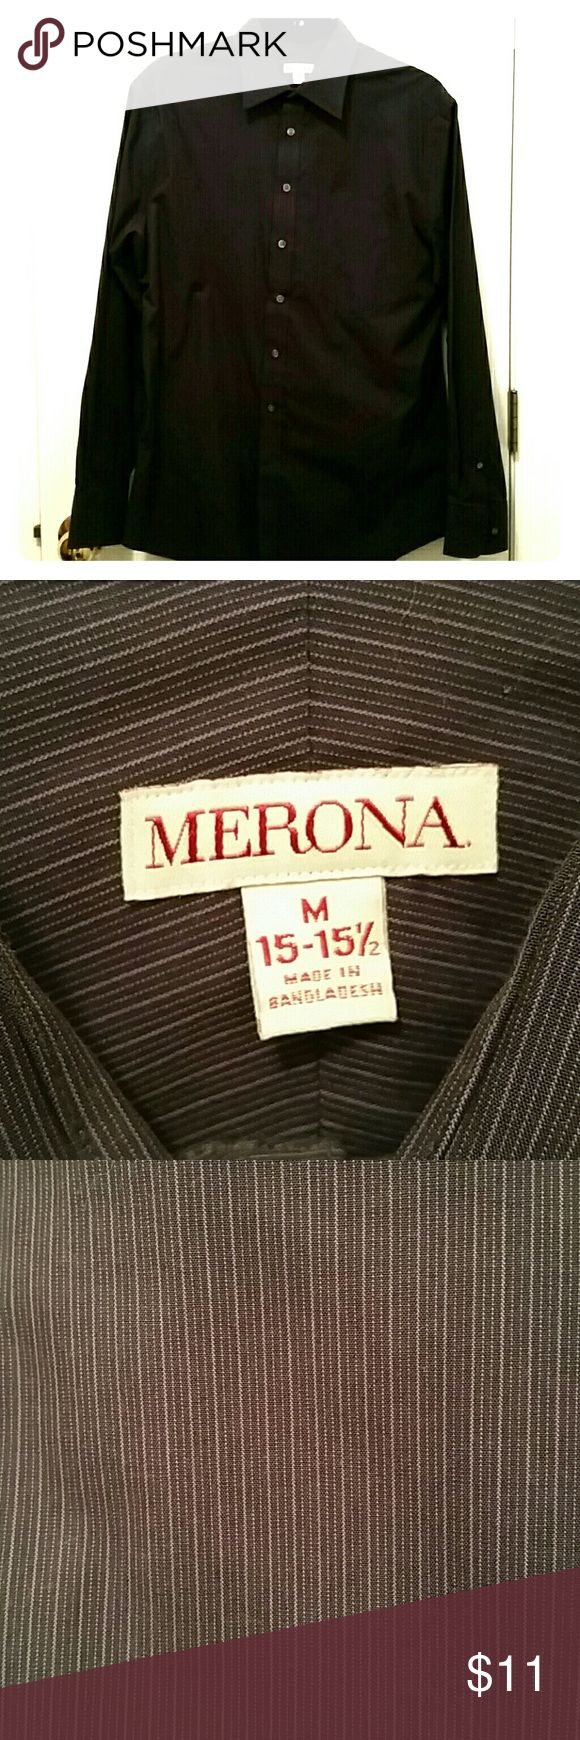 Men's Purple Dress Shirt Men's dark purple dress shirt.  Faint light purple stripes.  Great condition.  Worn only 2 or 3 times. Merona Shirts Dress Shirts